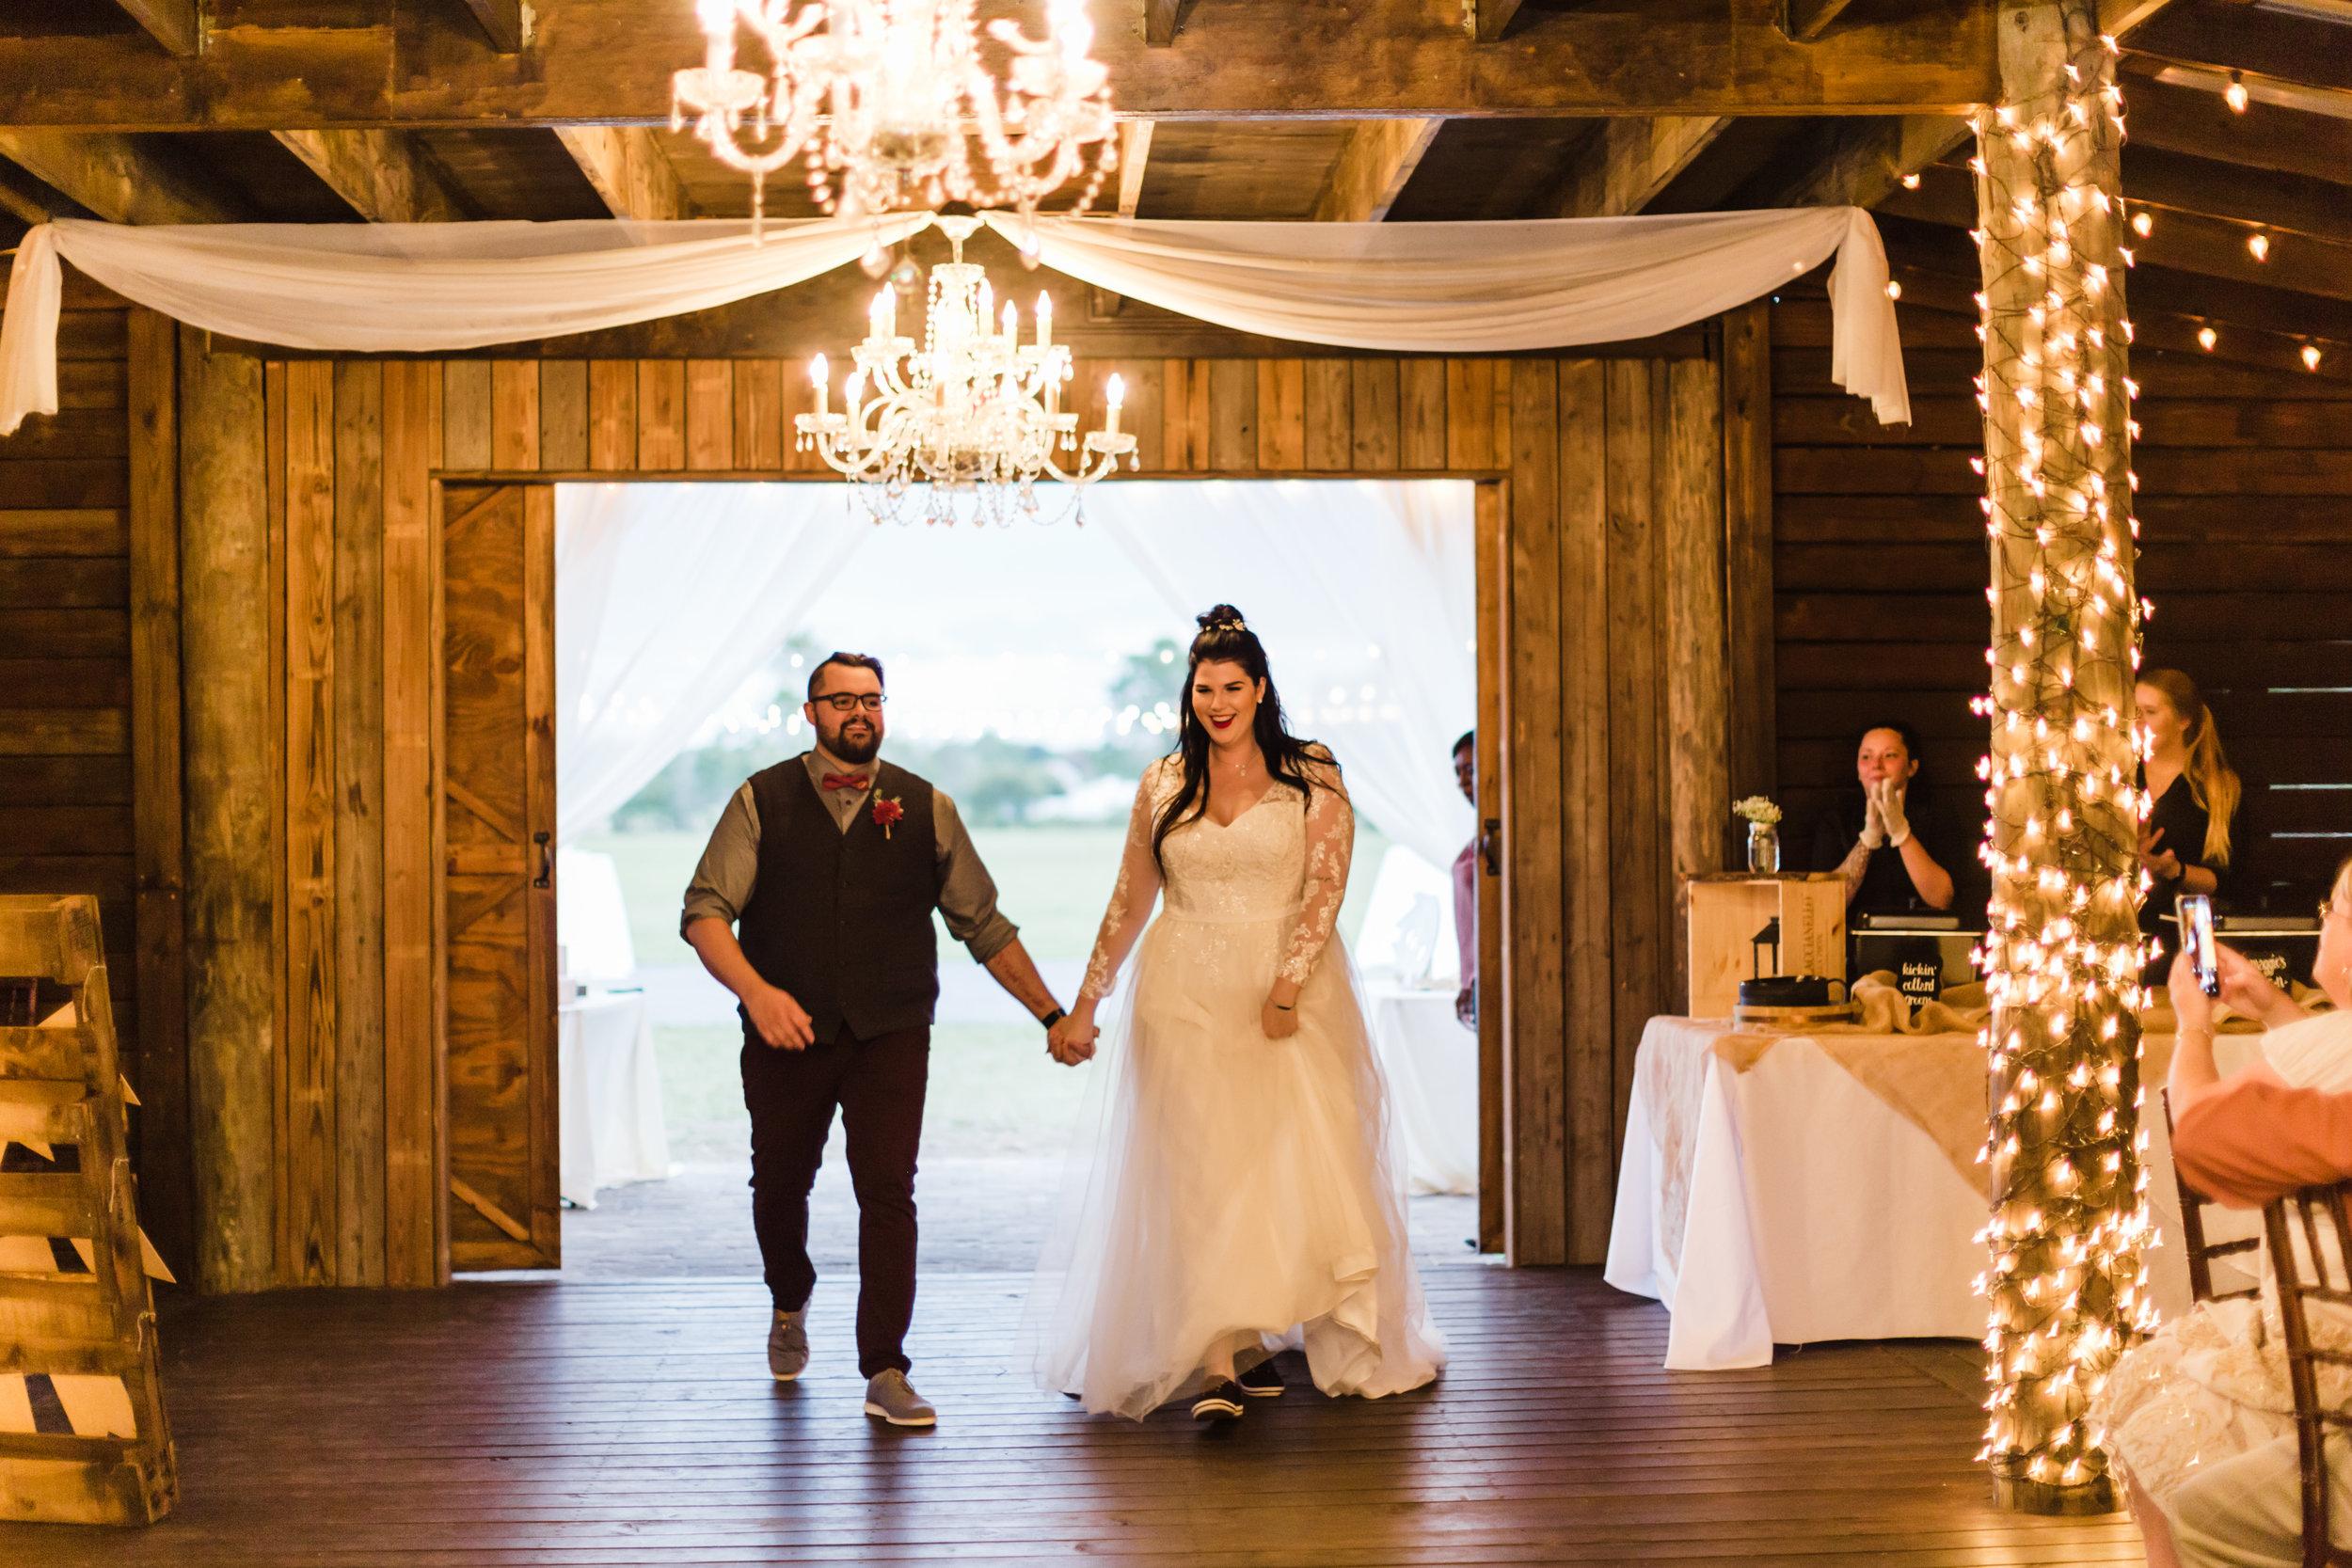 2018.11.11 Paige and TJ Enchanting Barn Wedding (531 of 841).jpg